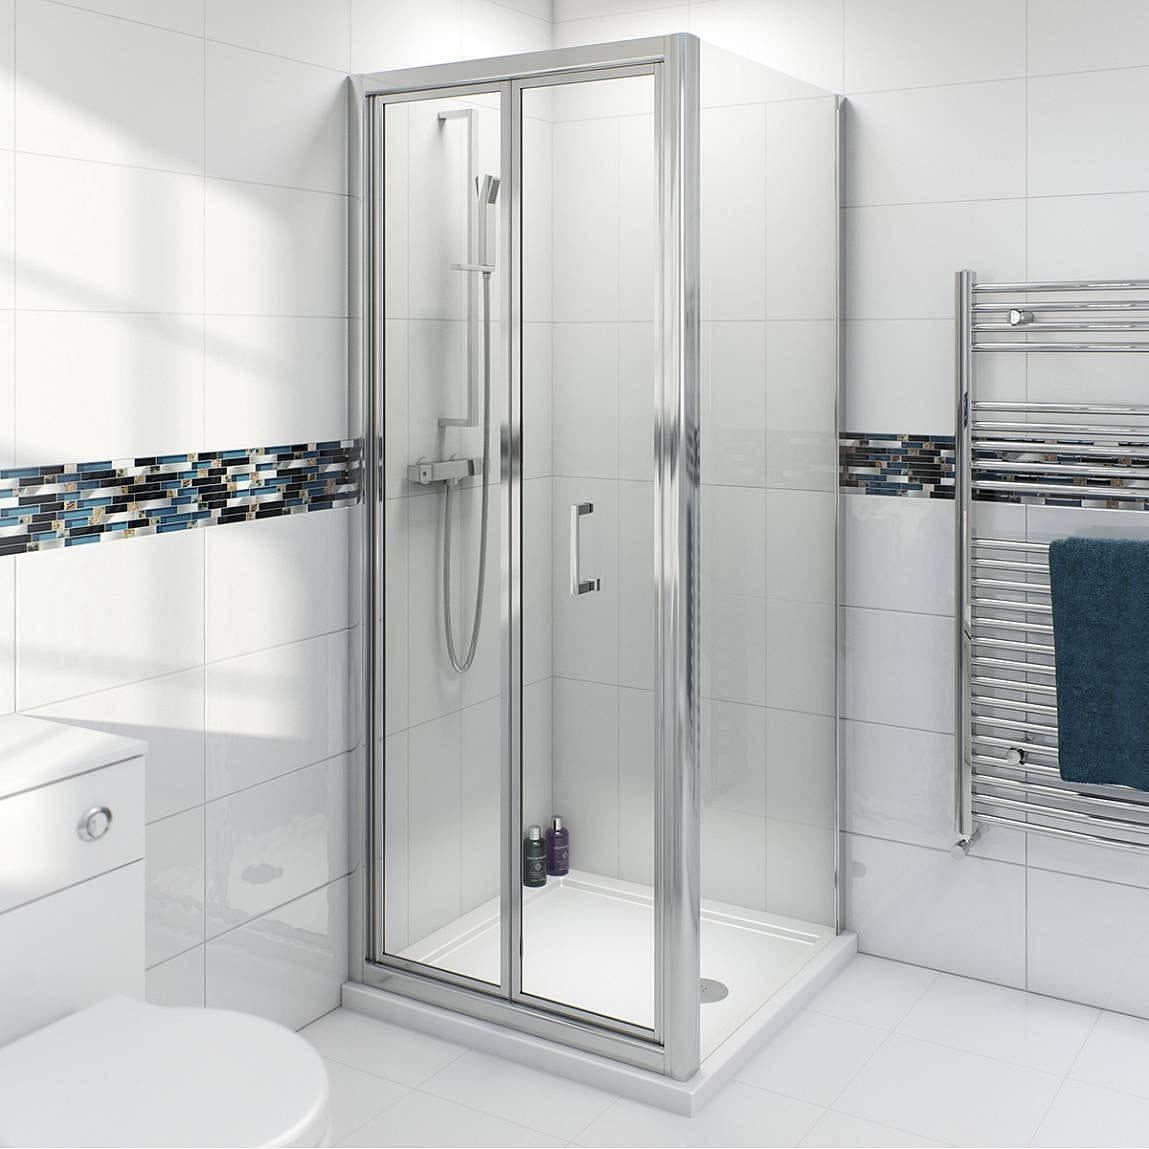 Clarity 4mm bifold door square shower enclosure